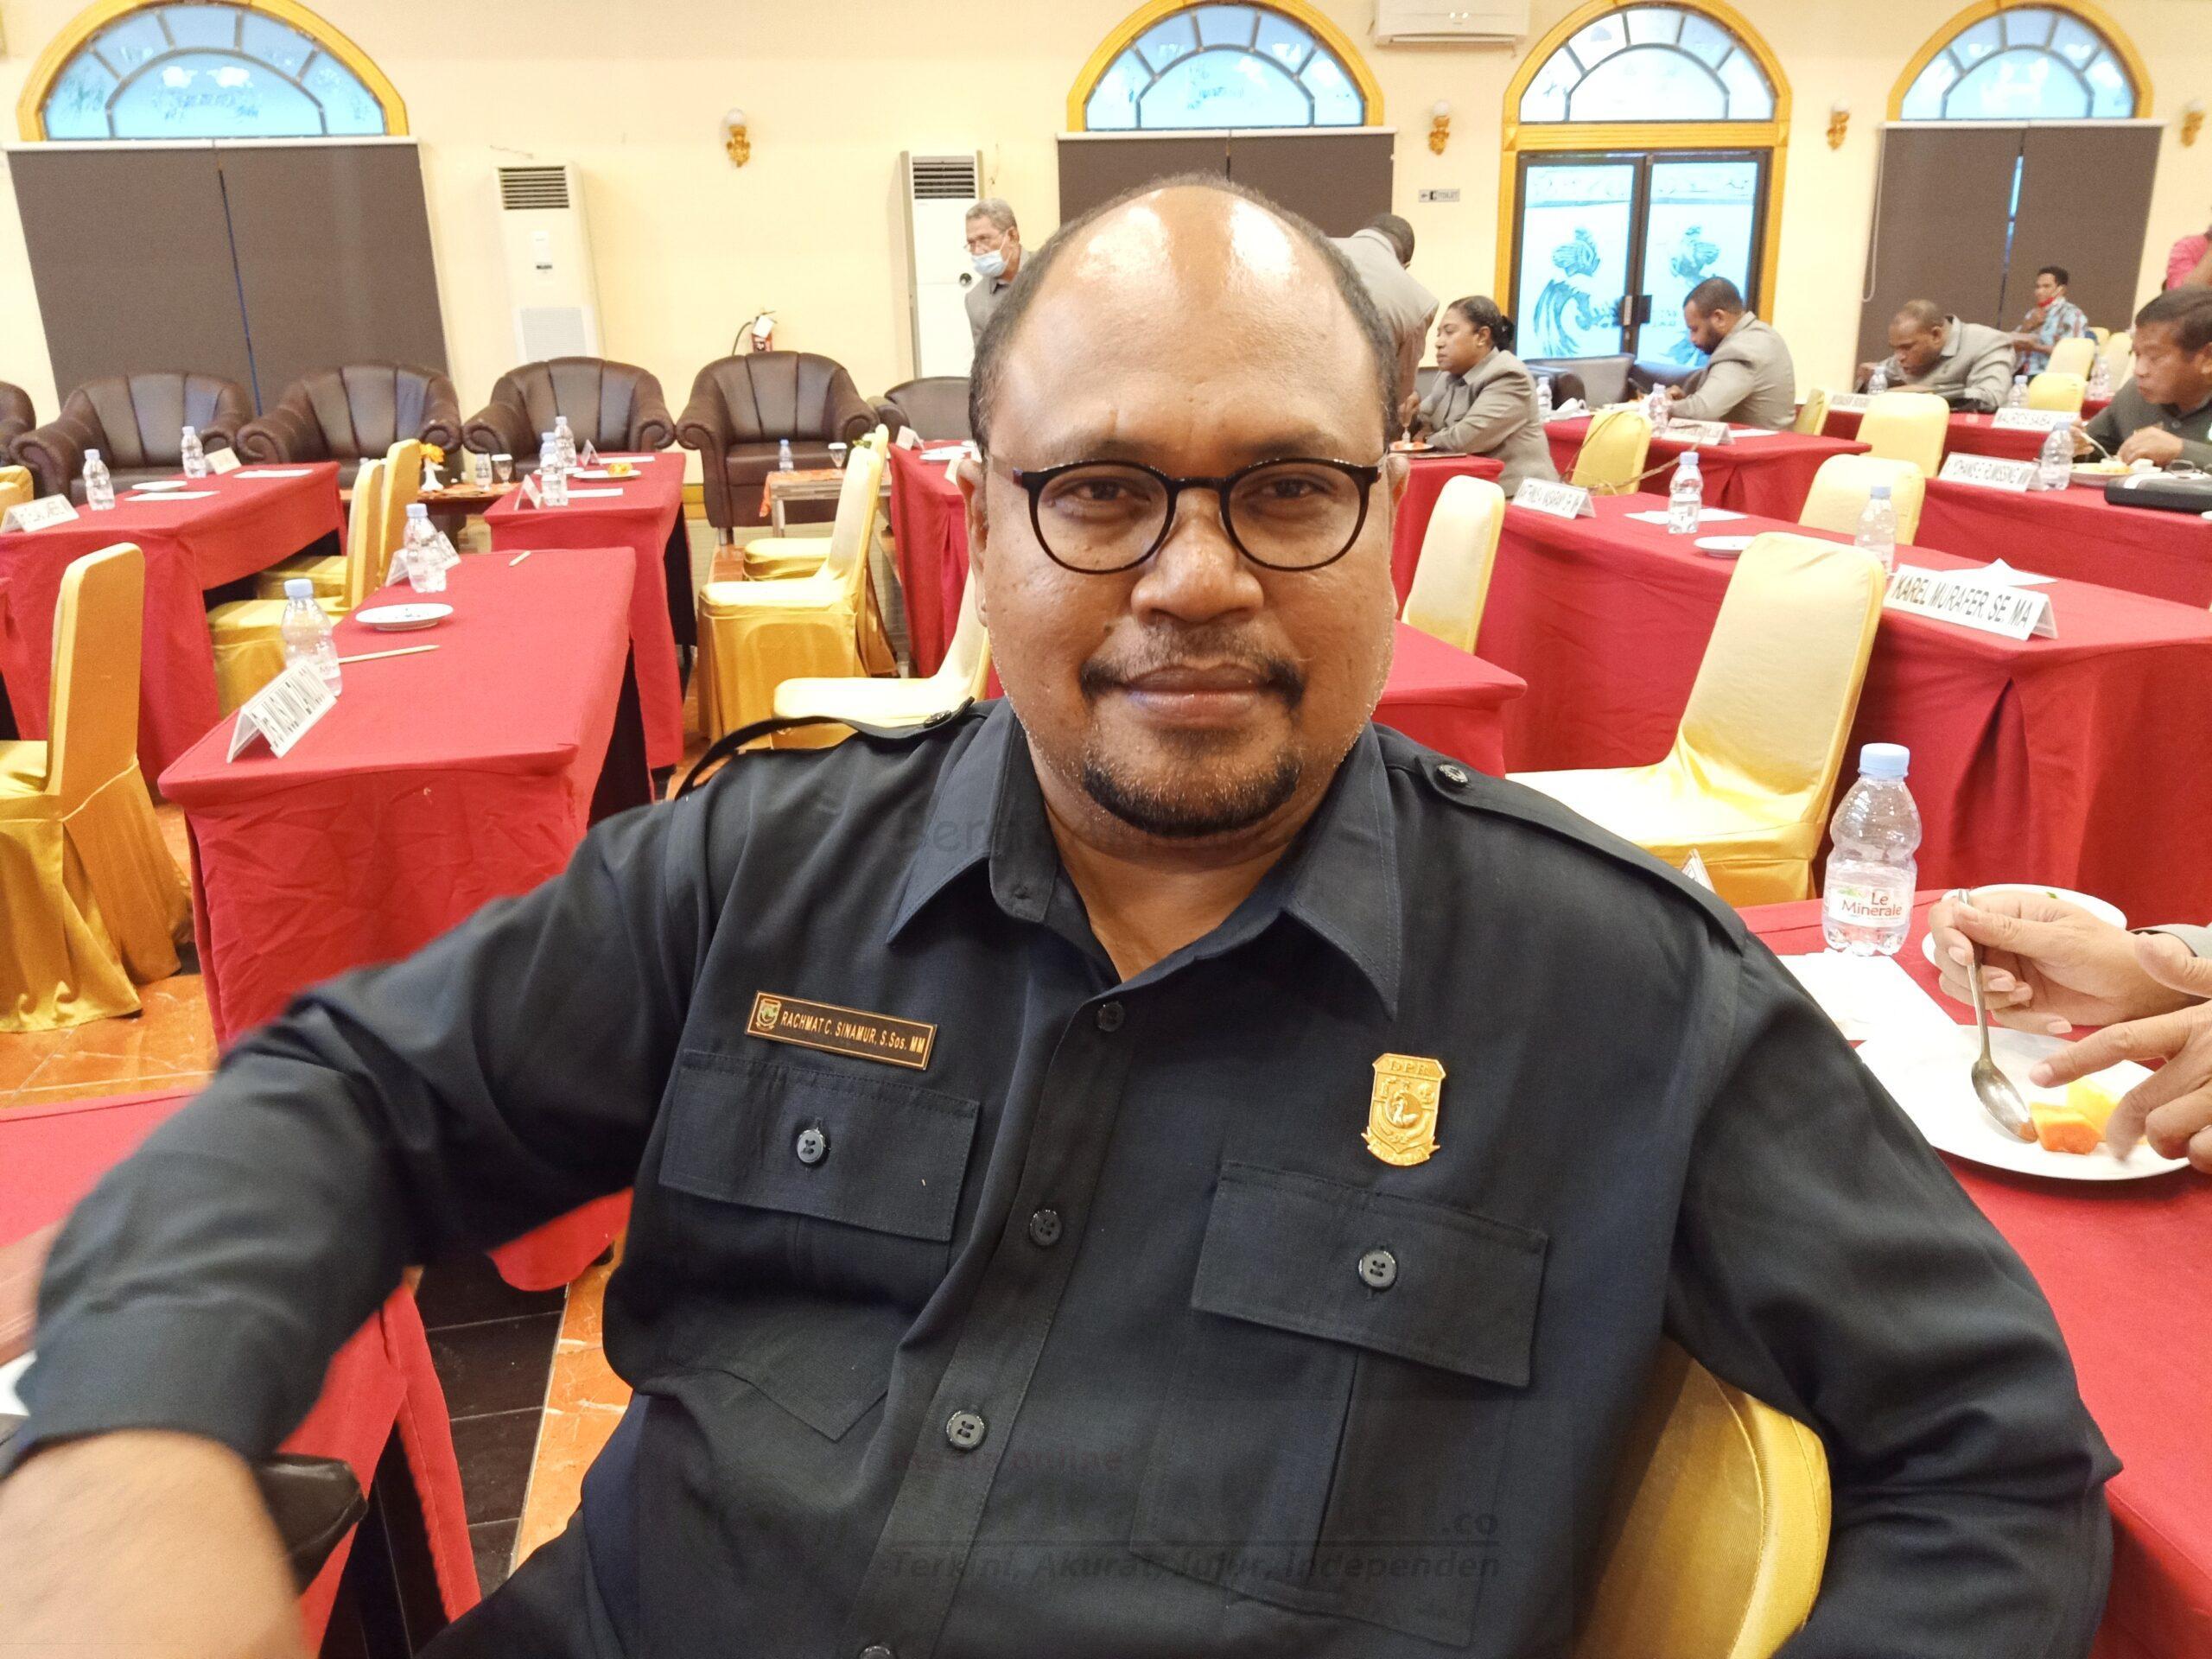 DPW PAN Papua Barat Gelar Musda Secara Virtual Diakhir Februari 2021 8 IMG 20210221 220607 scaled